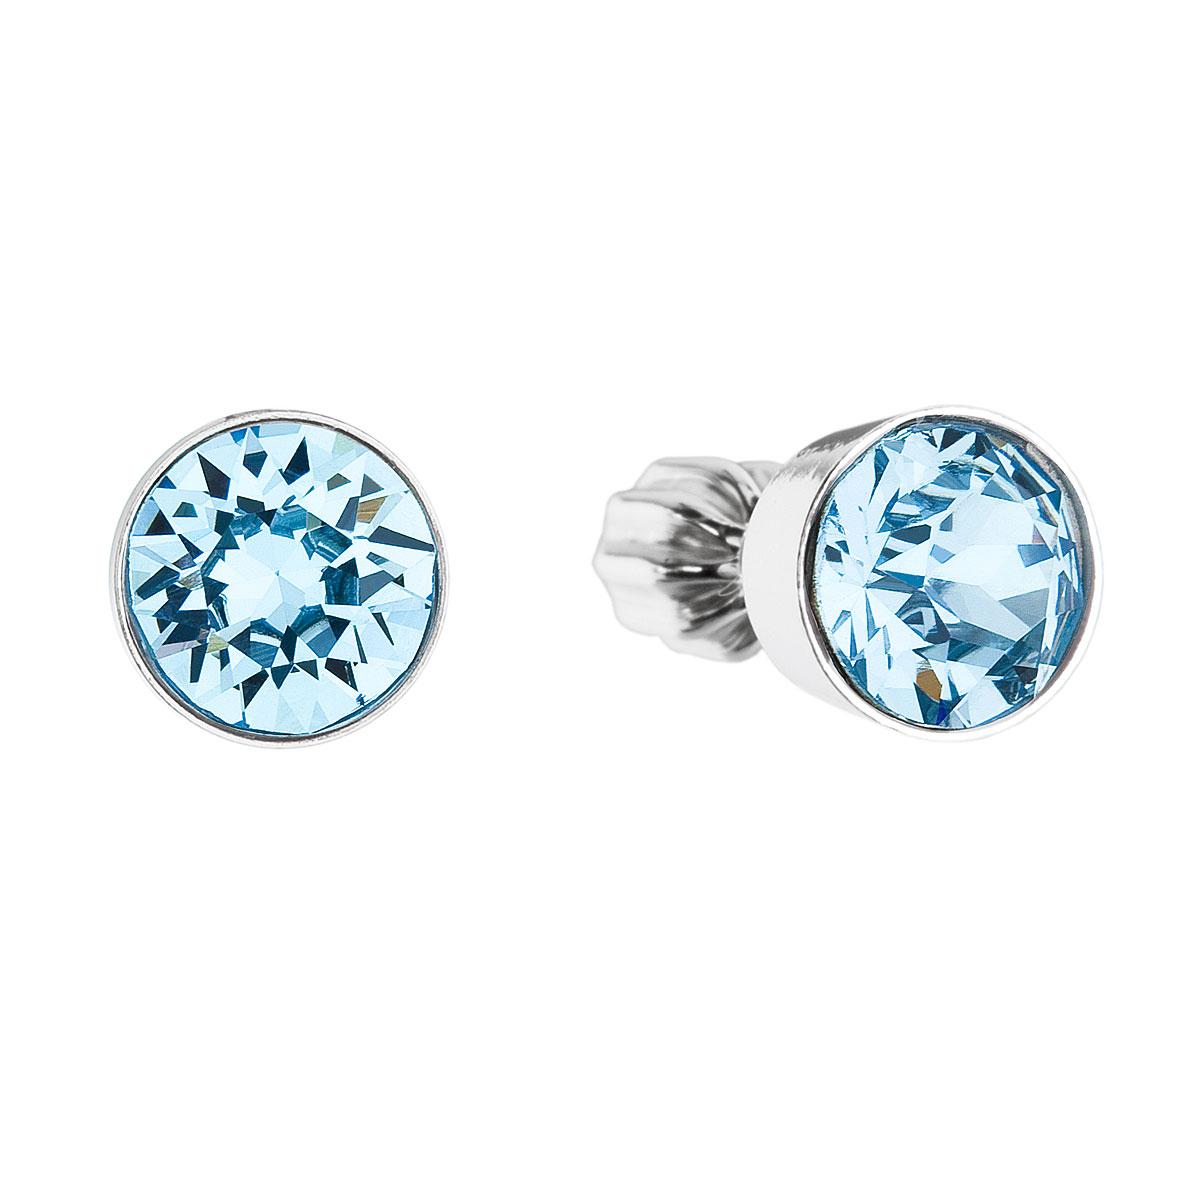 Evolution Group Stříbrné náušnice pecka s krystaly modré kulaté 31113.3 aqua